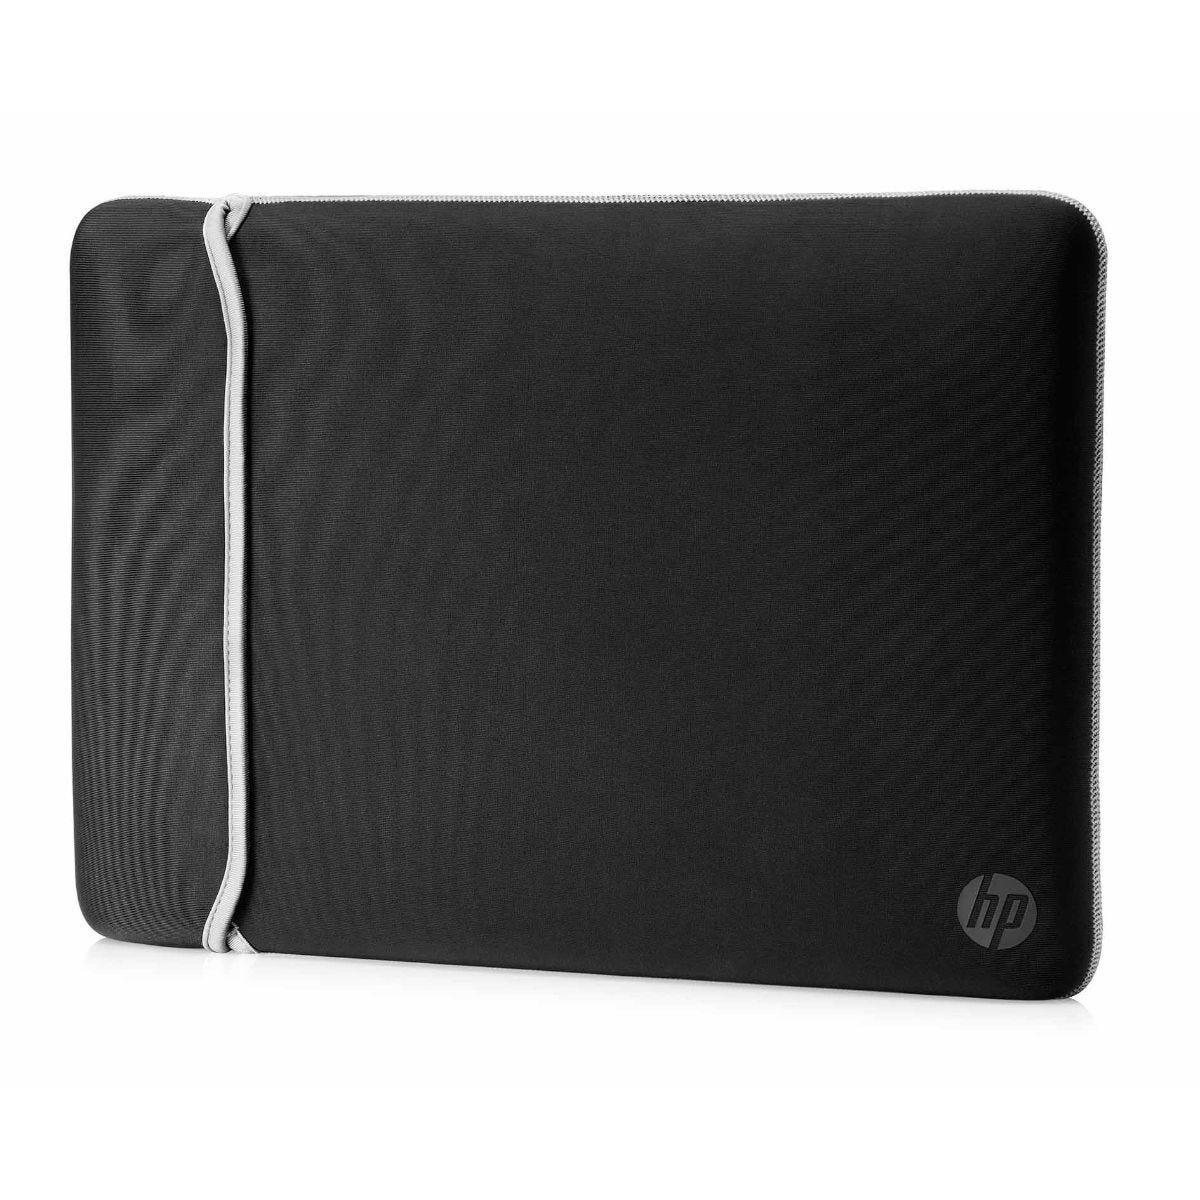 HP Neoprene 14 Inch Reversible Laptop Sleeve - Black and Silver